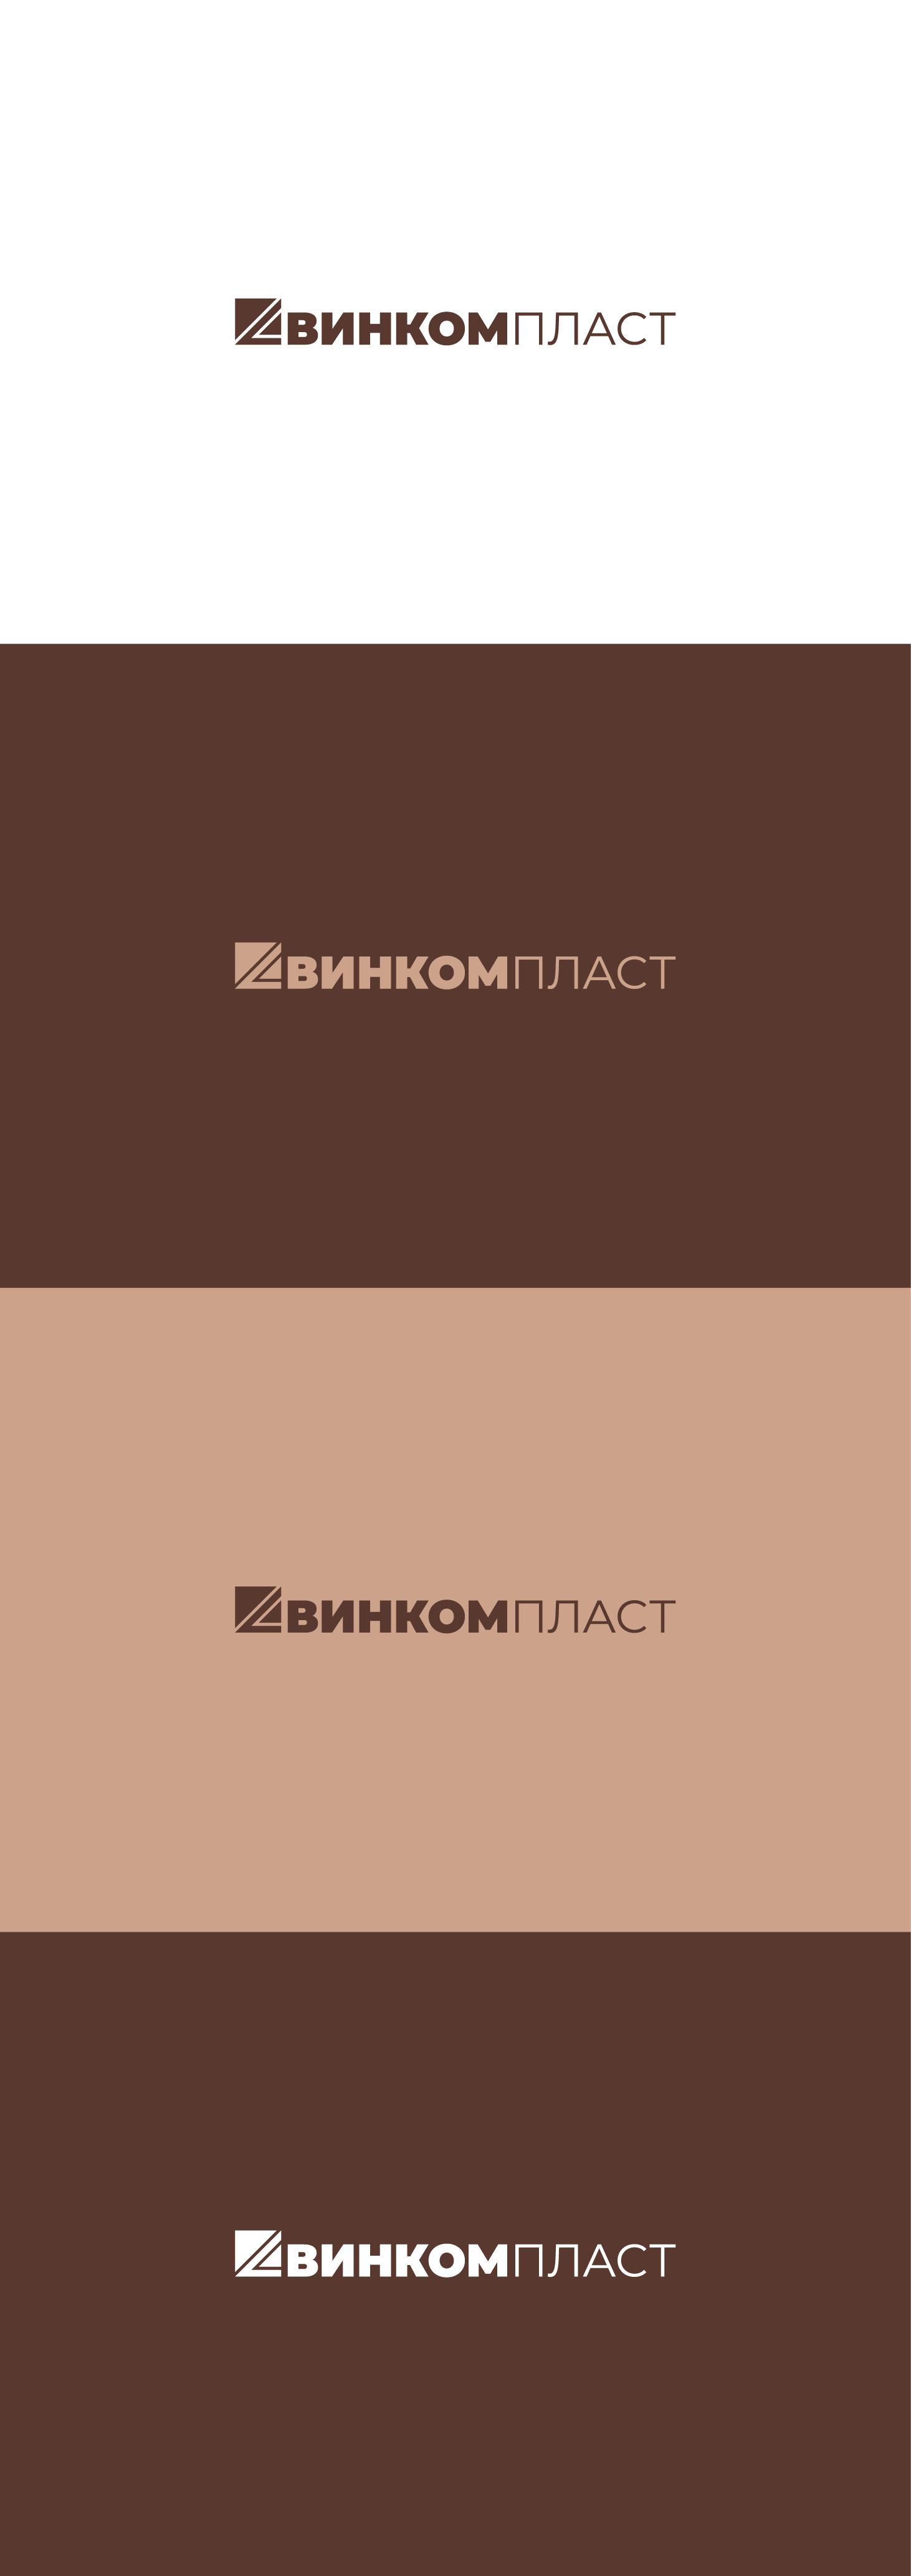 Логотип, фавикон и визитка для компании Винком Пласт  фото f_3455c37914dc71cb.png